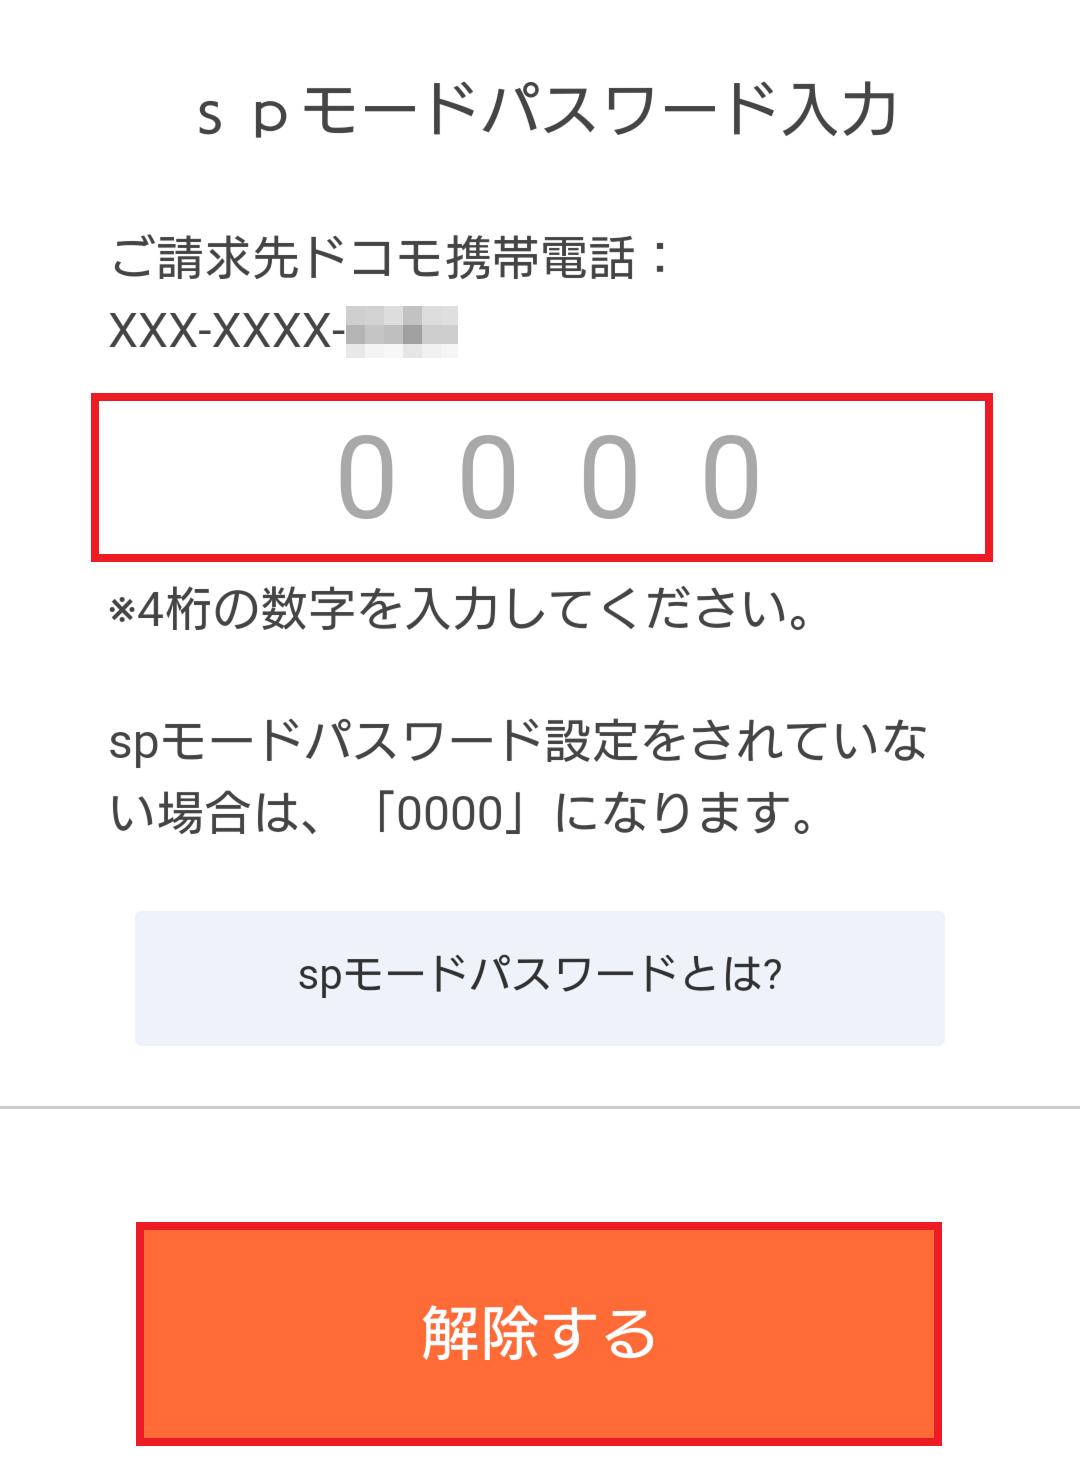 SPモードパスワード入力